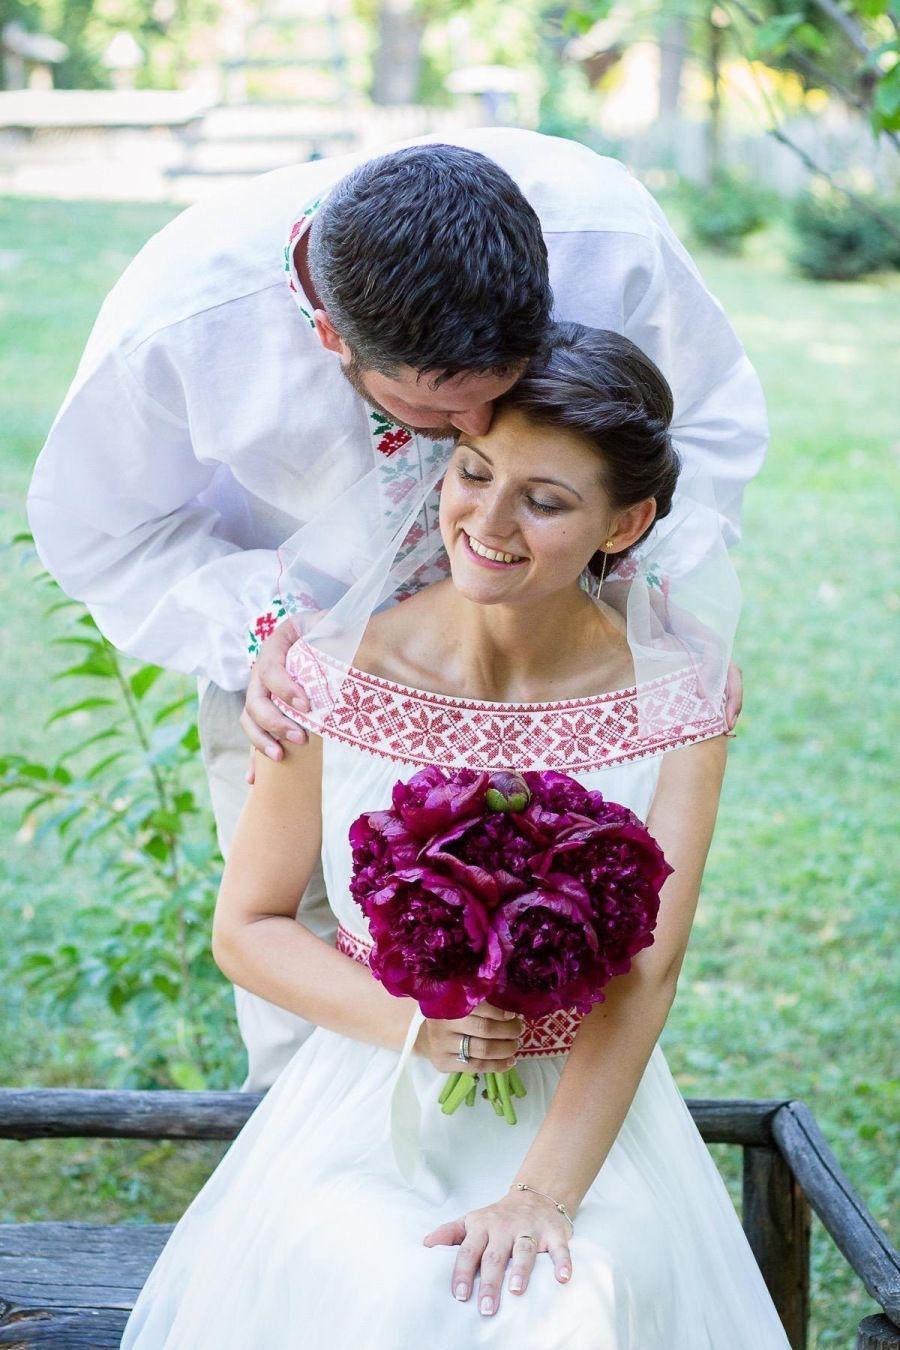 Nunta Traditionala Romaneasca Romanian Traditions Wedding